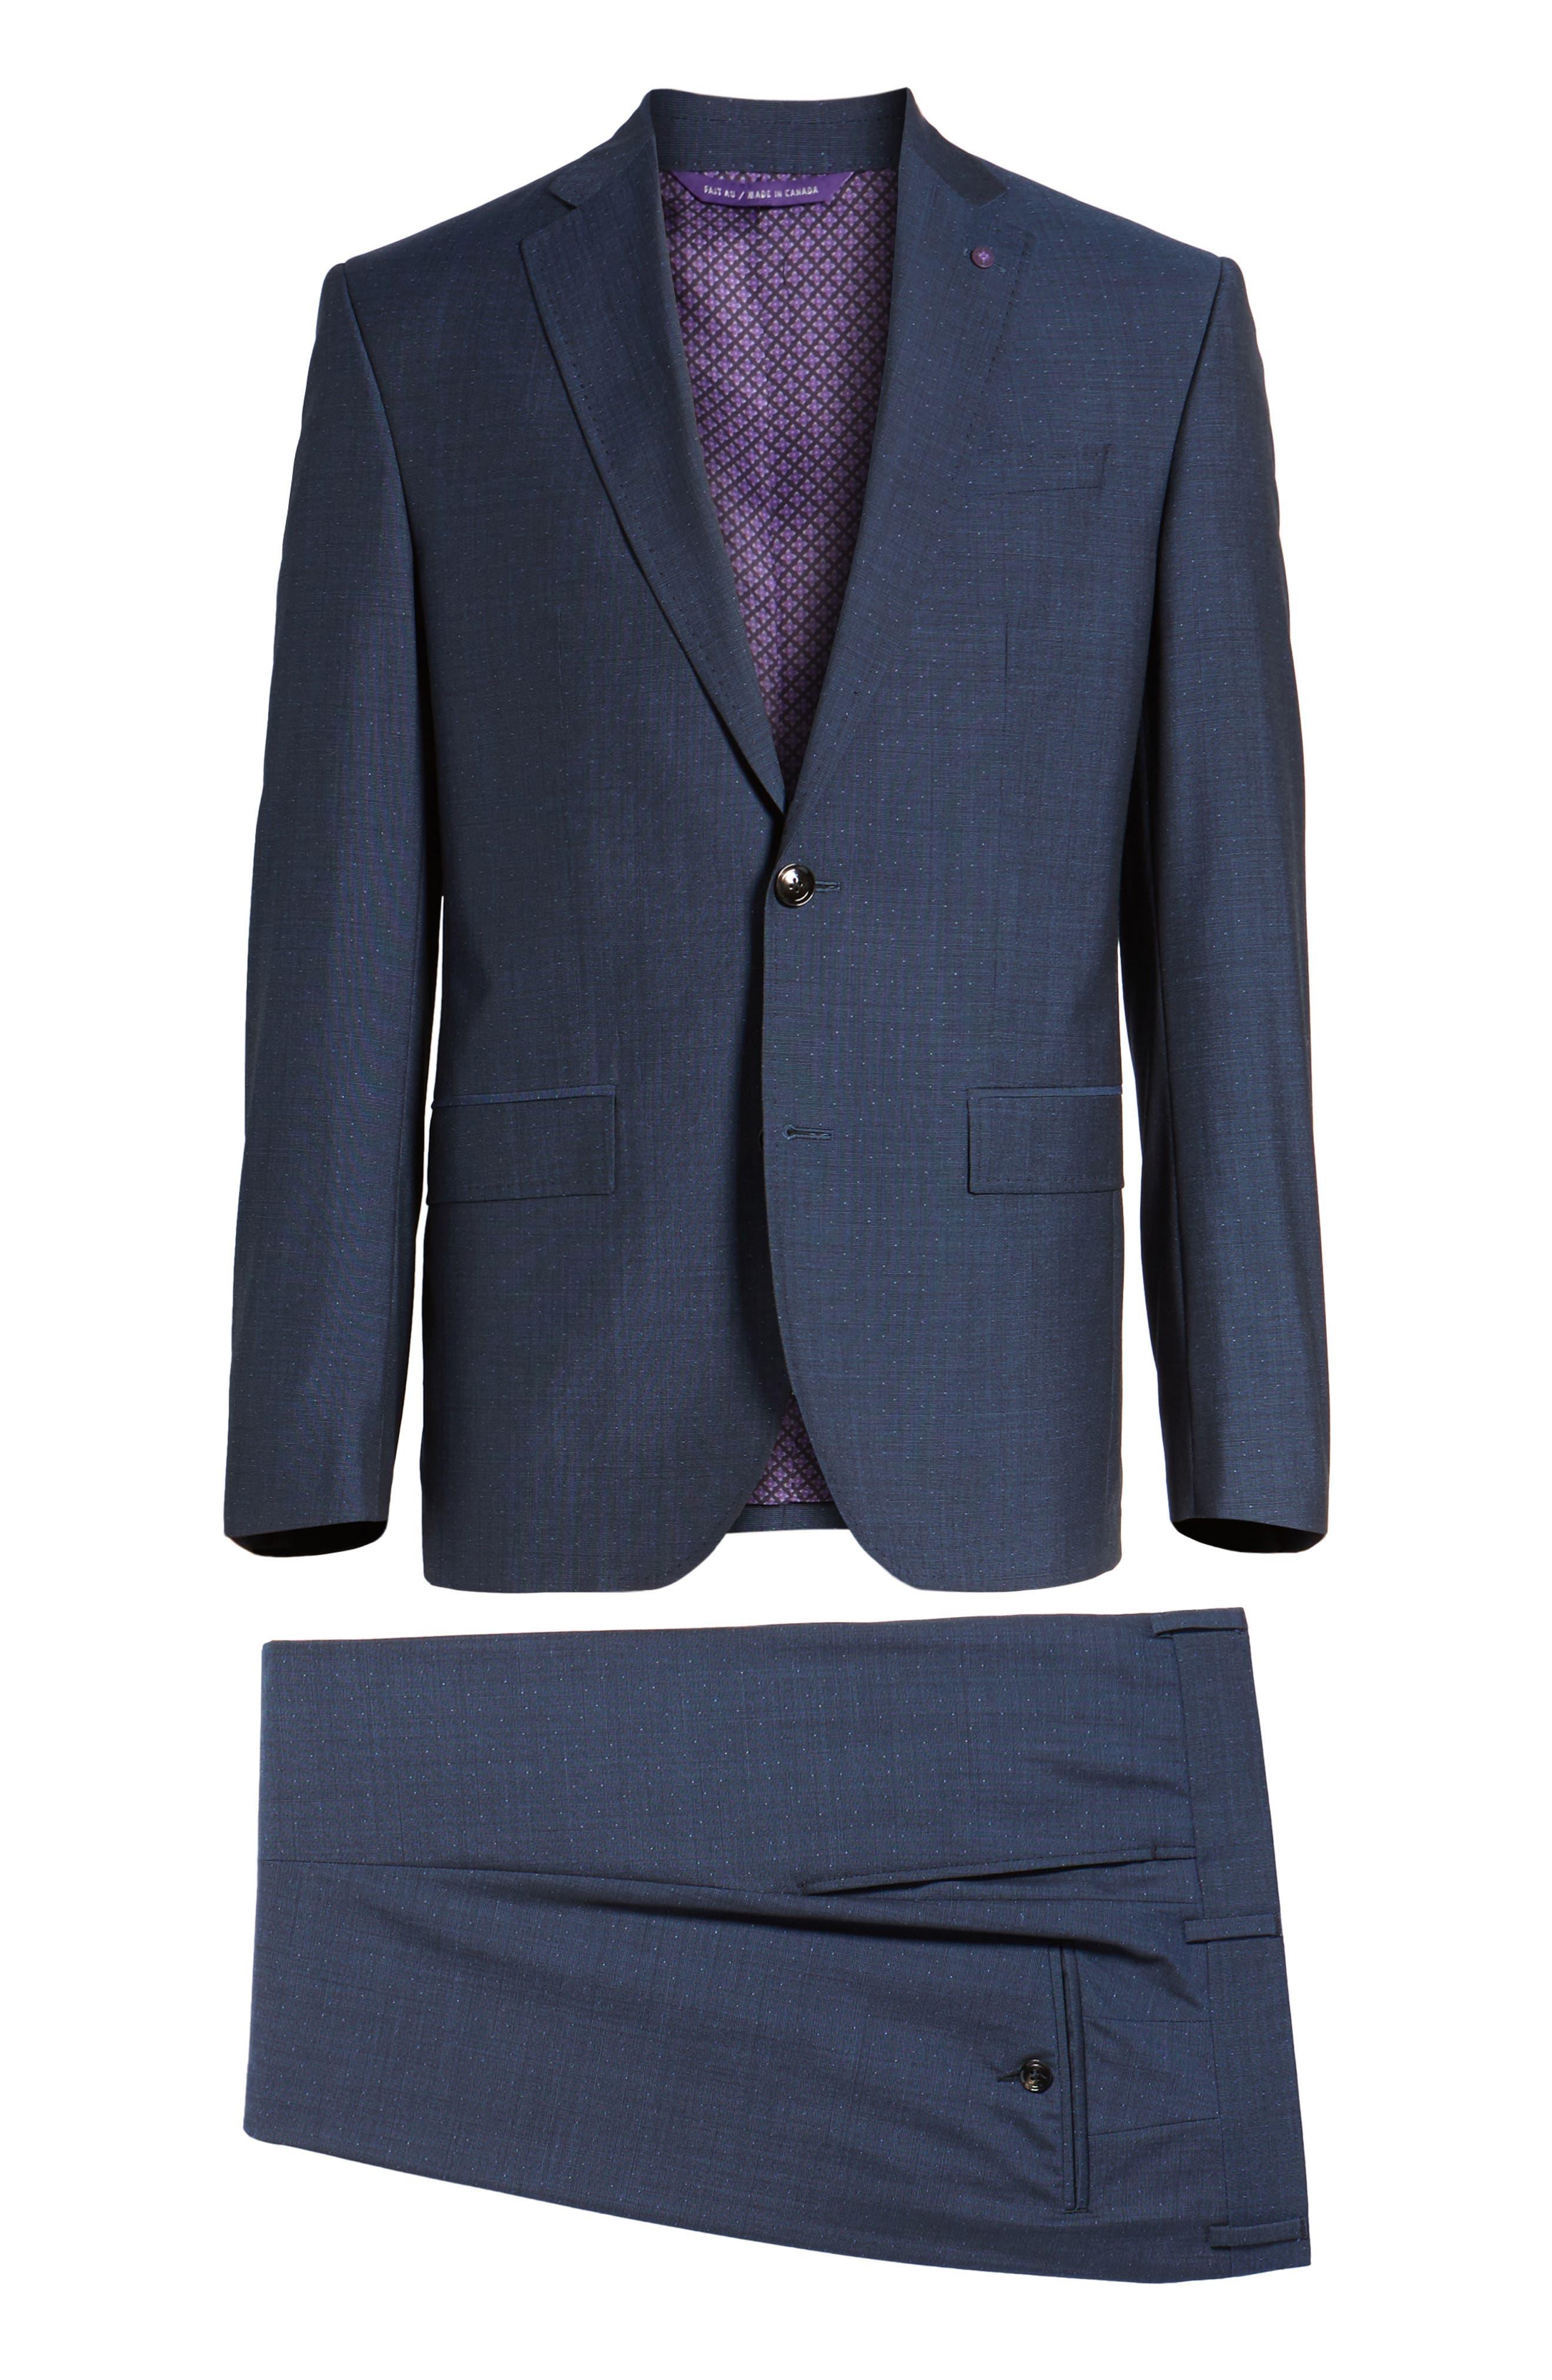 Roger Extra Slim Fit Dot Wool Suit,                             Alternate thumbnail 8, color,                             Dark Blue